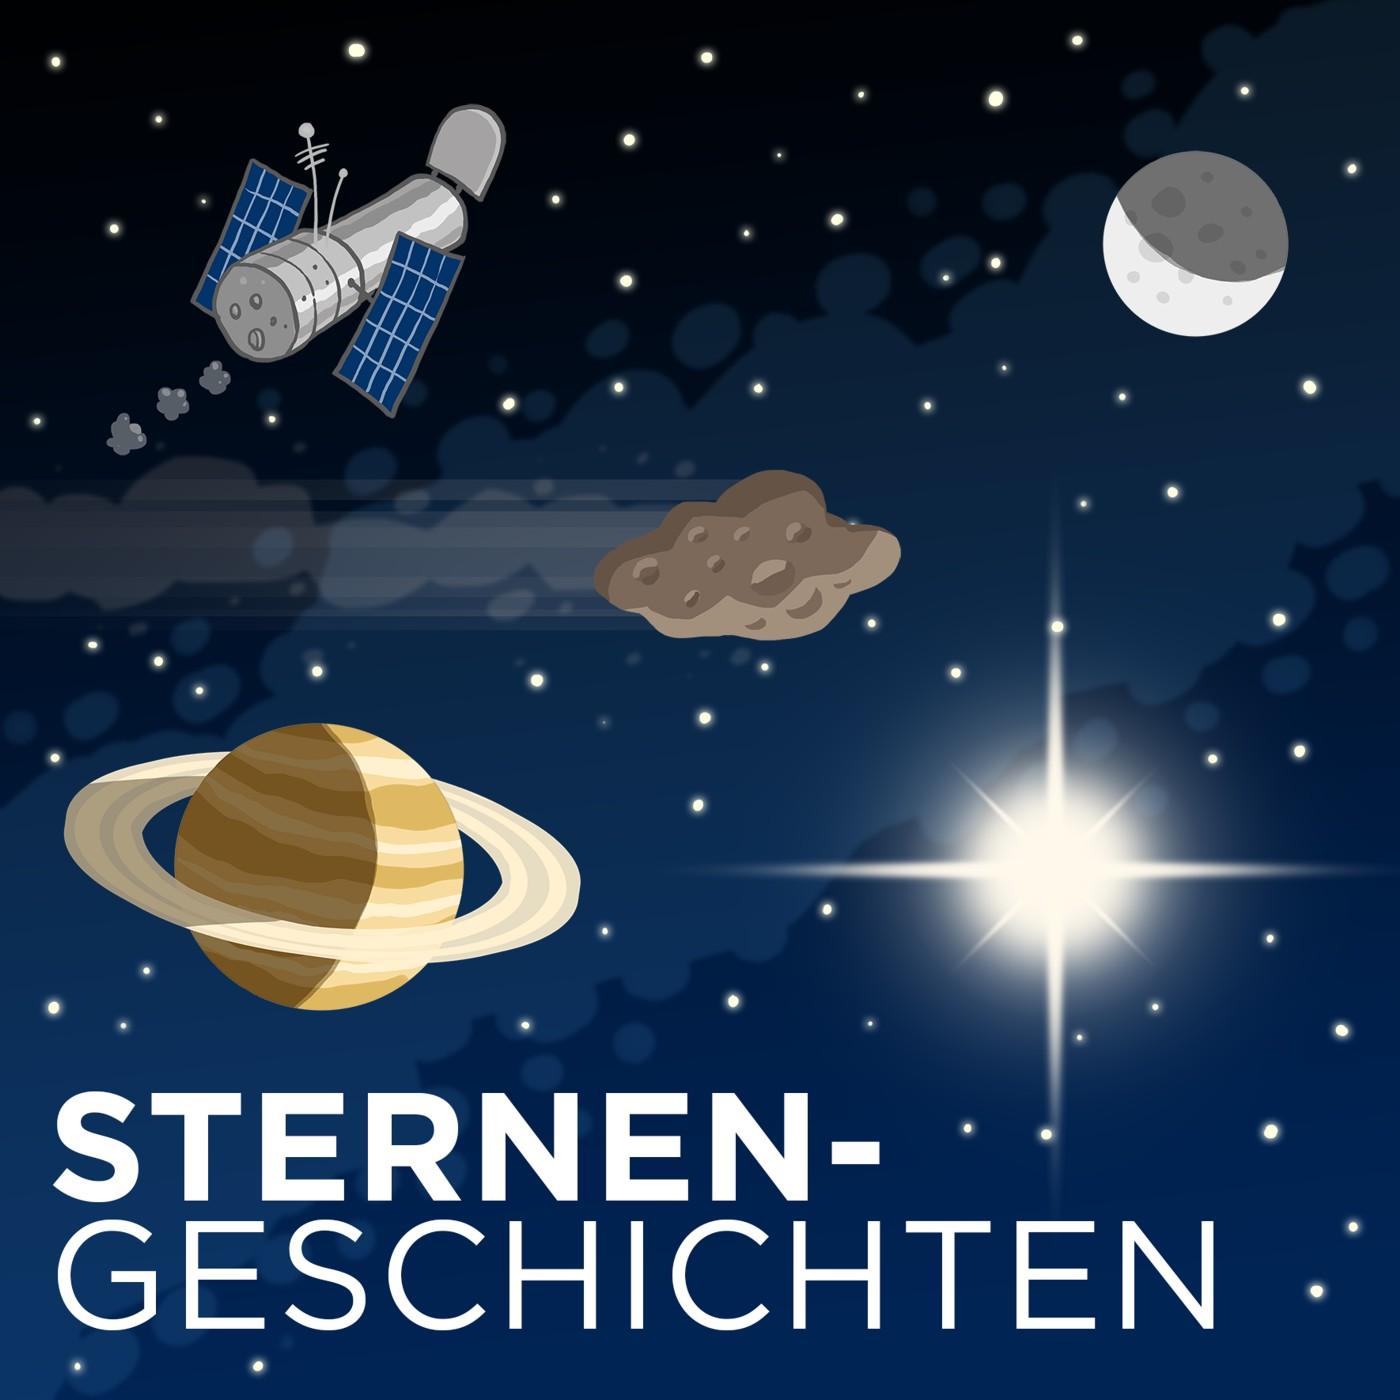 Sternengeschichten Folge 389: Das Hubble-Weltraumteleskop